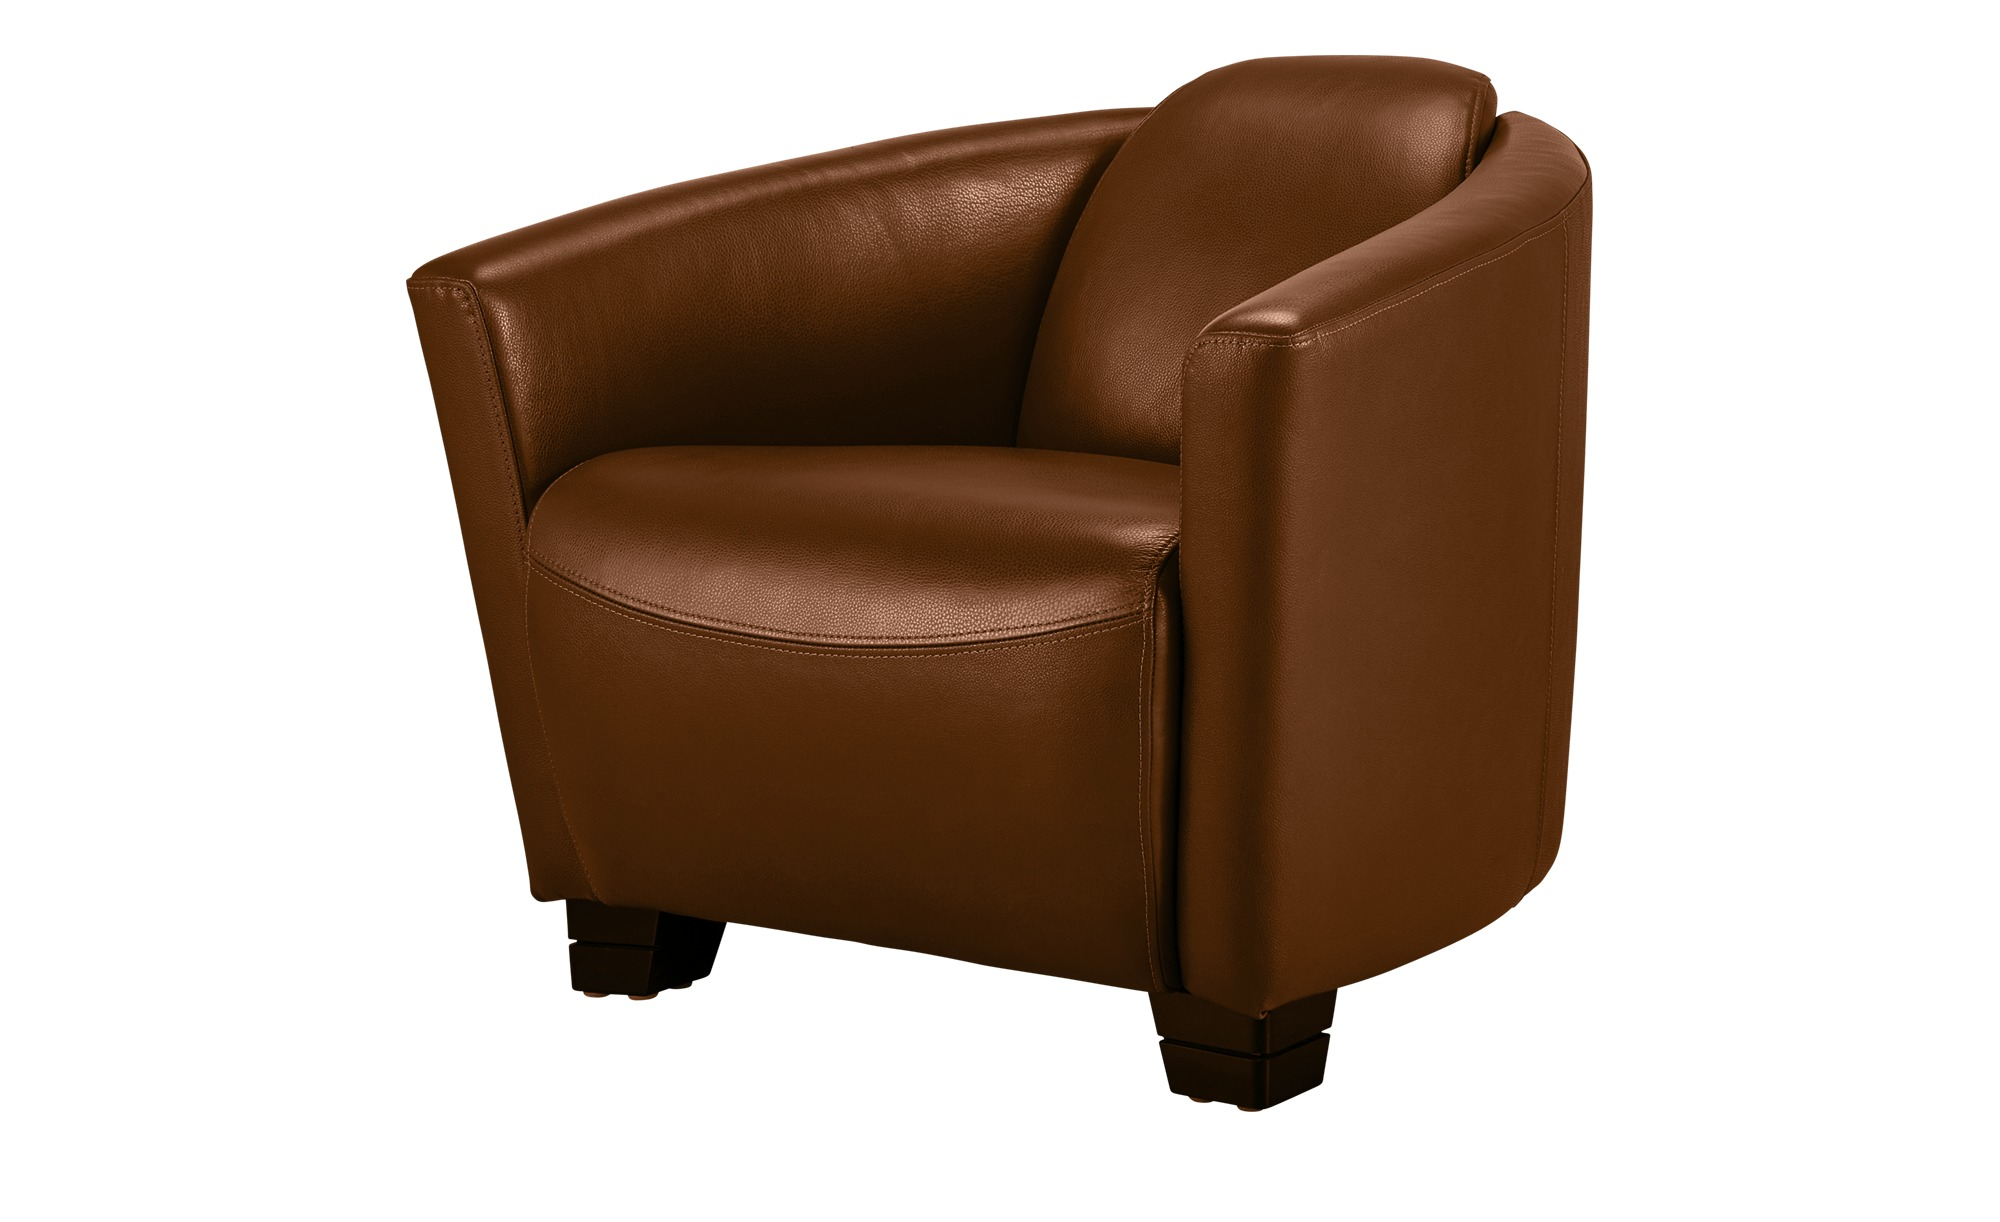 uno Ledersessel braun - Leder Taylor ¦ braun ¦ Maße (cm): B: 79 H: 73 T: 85 Polstermöbel > Sessel > Ledersessel - Höffner